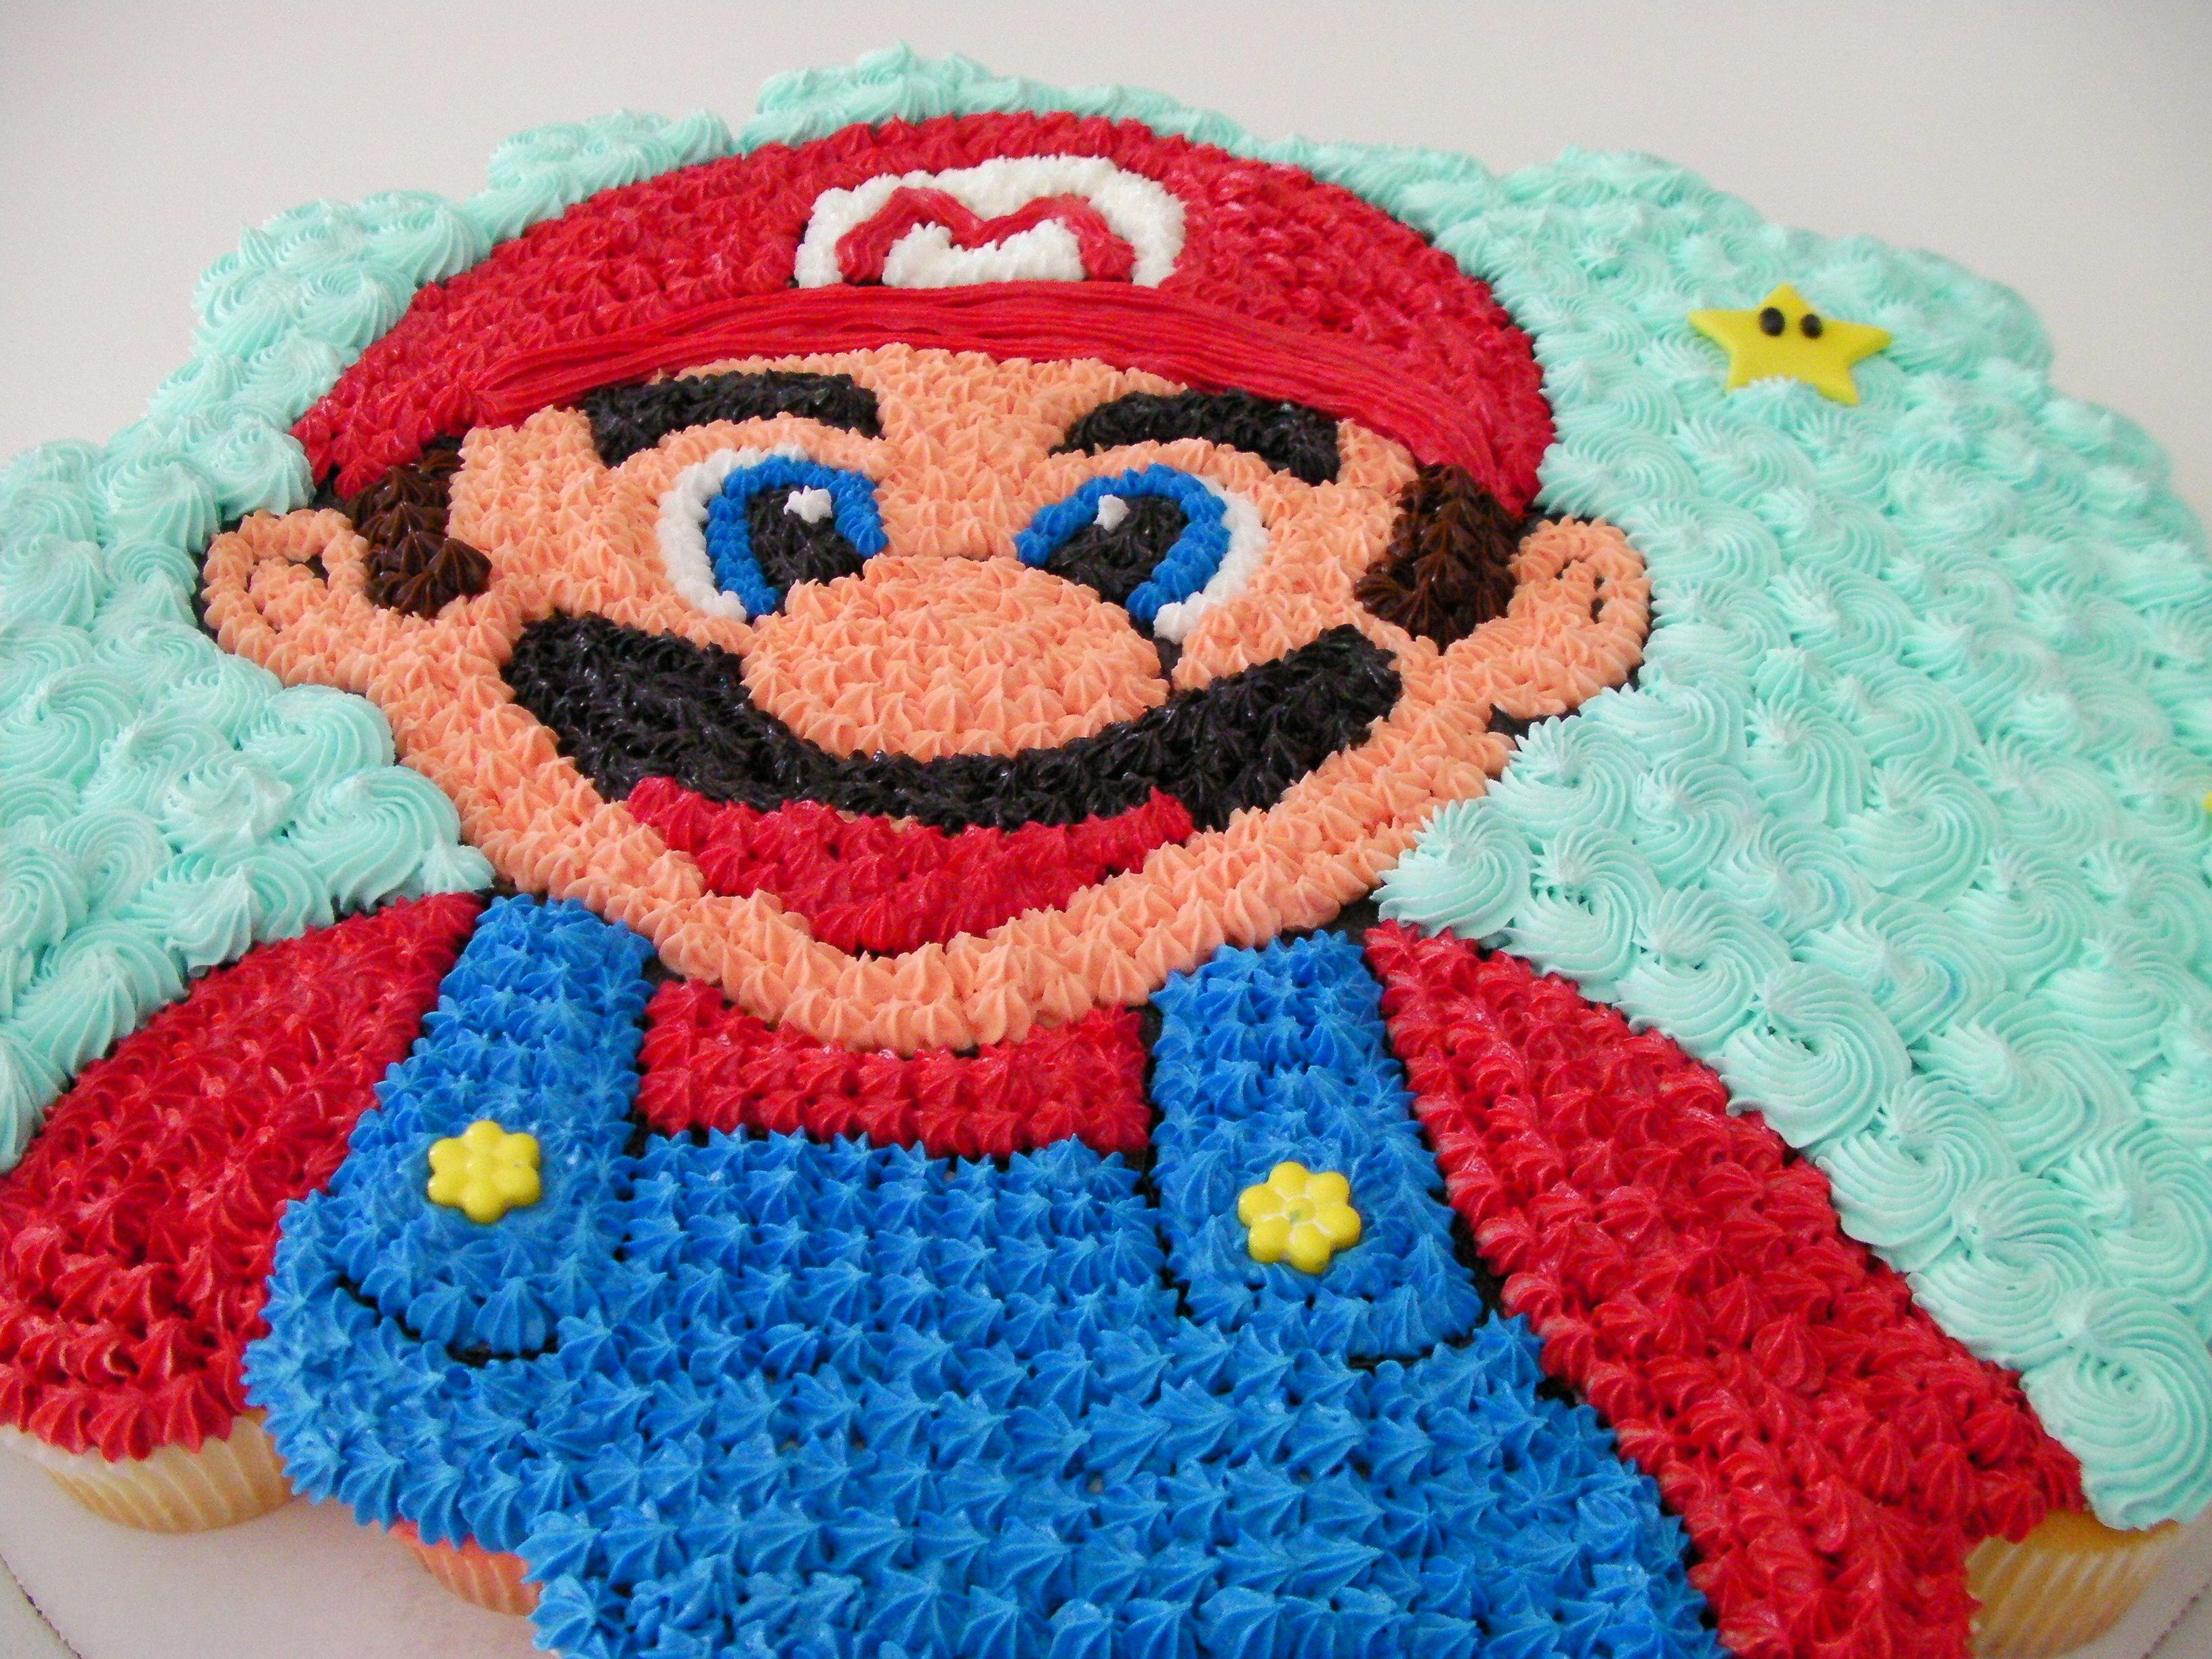 Mario birthday 6 cake clipart on white background clip art black and white download Mario Bro. cupcake cake   Roni cupcake cakes   Mario cake ... clip art black and white download